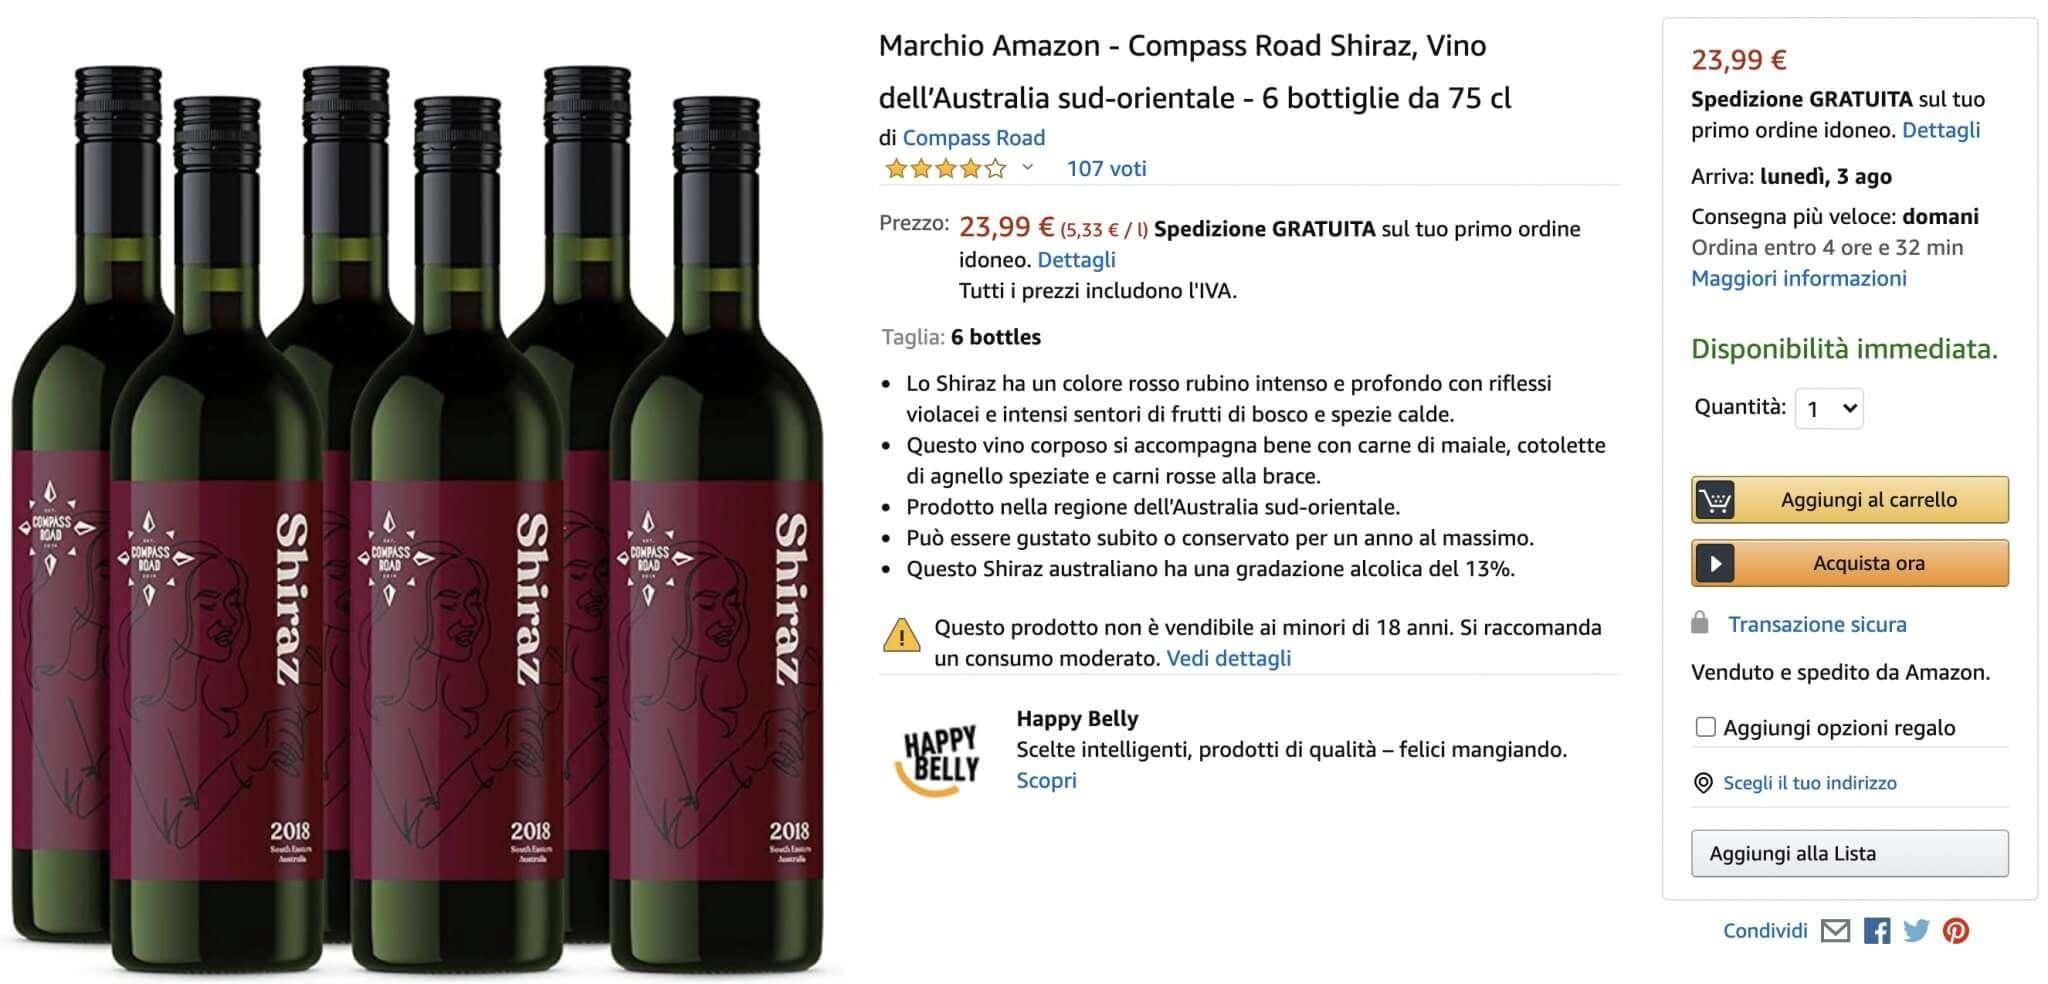 vino marchio amazon